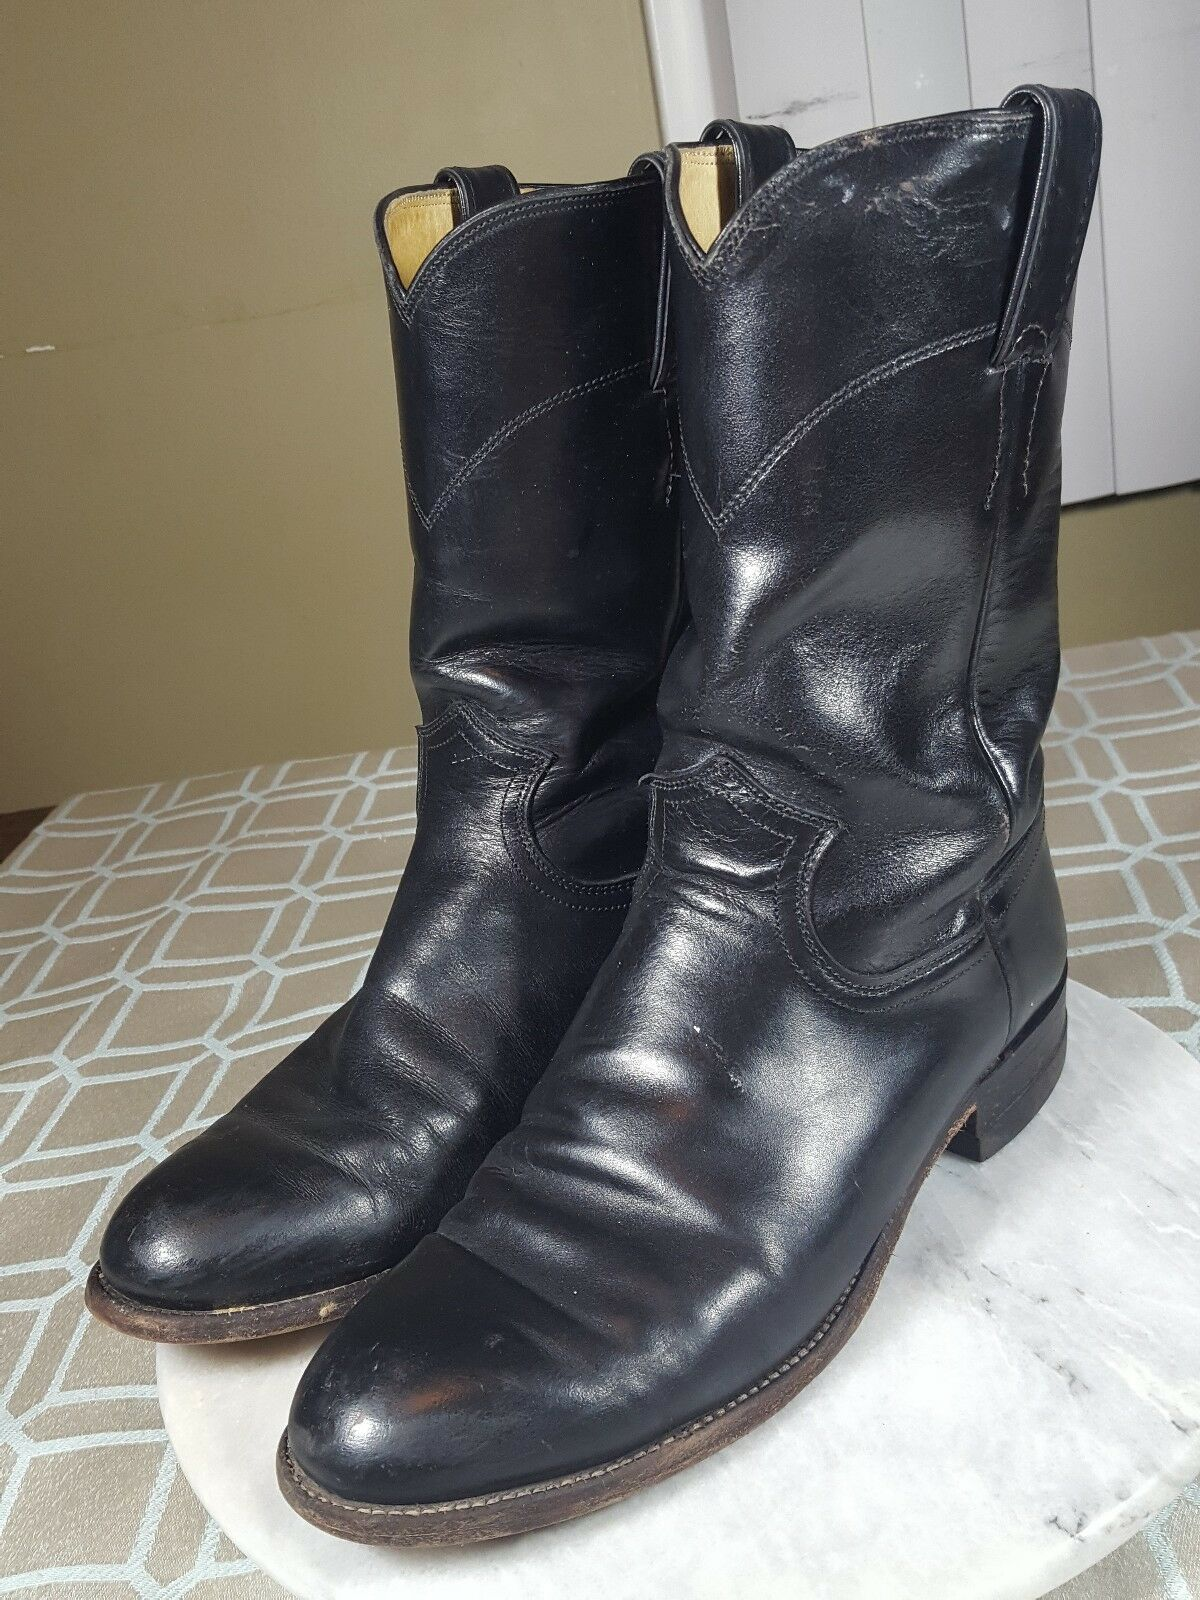 Vintage Justin Basics Roper Black Soft Leather Boots Woman's size US 7.5 D M